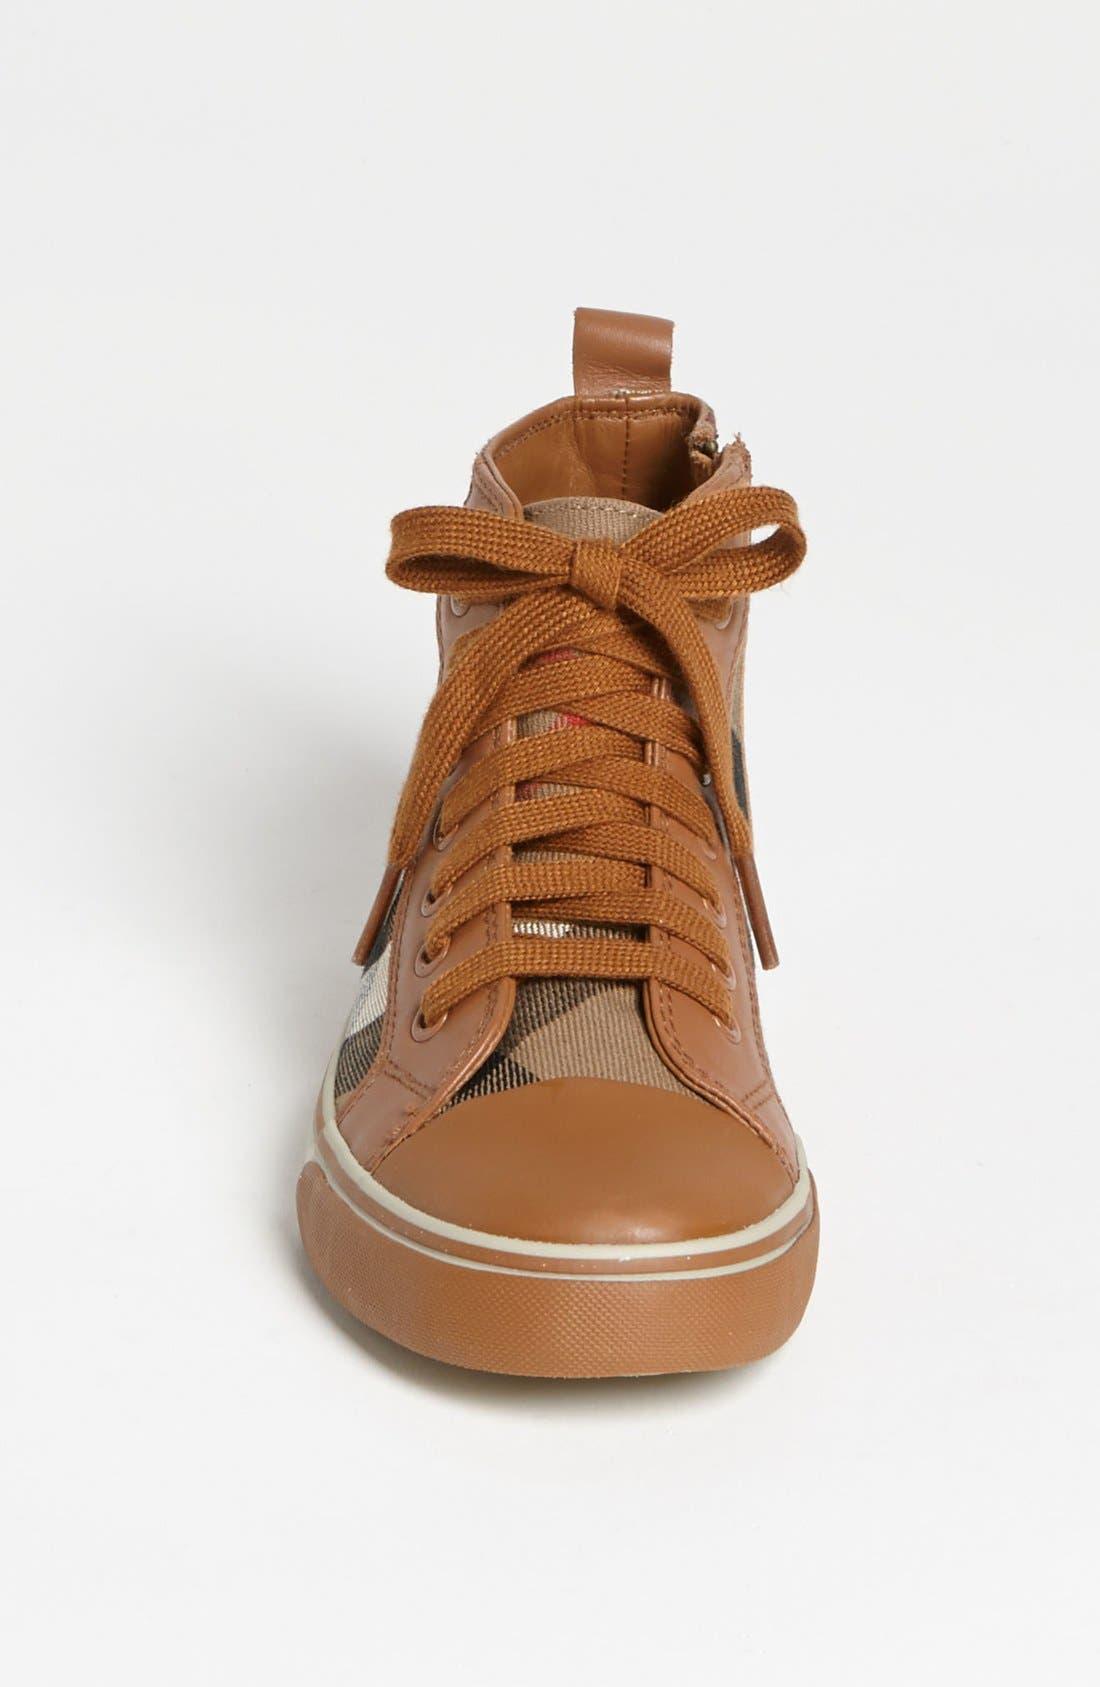 Alternate Image 3  - Burberry 'Tom' High Top Sneaker (Walker, Toddler, Little Kid & Big Kid)